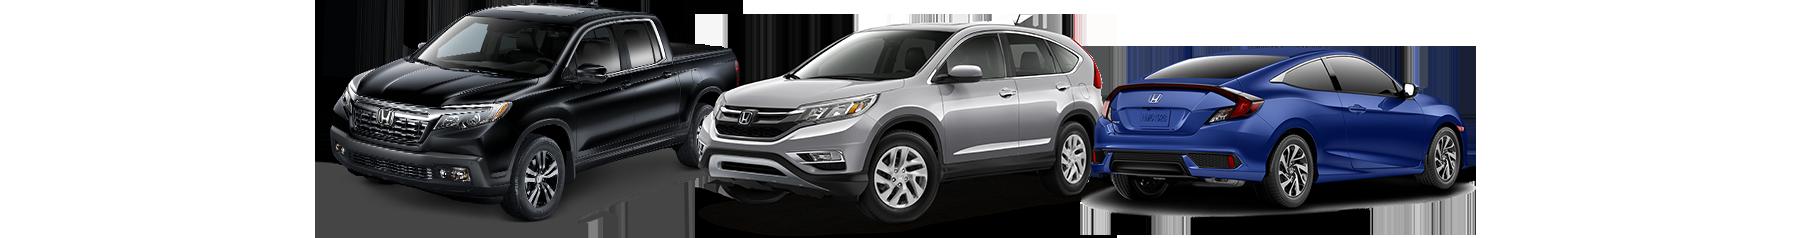 Wheaton-Honda-Civic-CRV-Ridgeline2